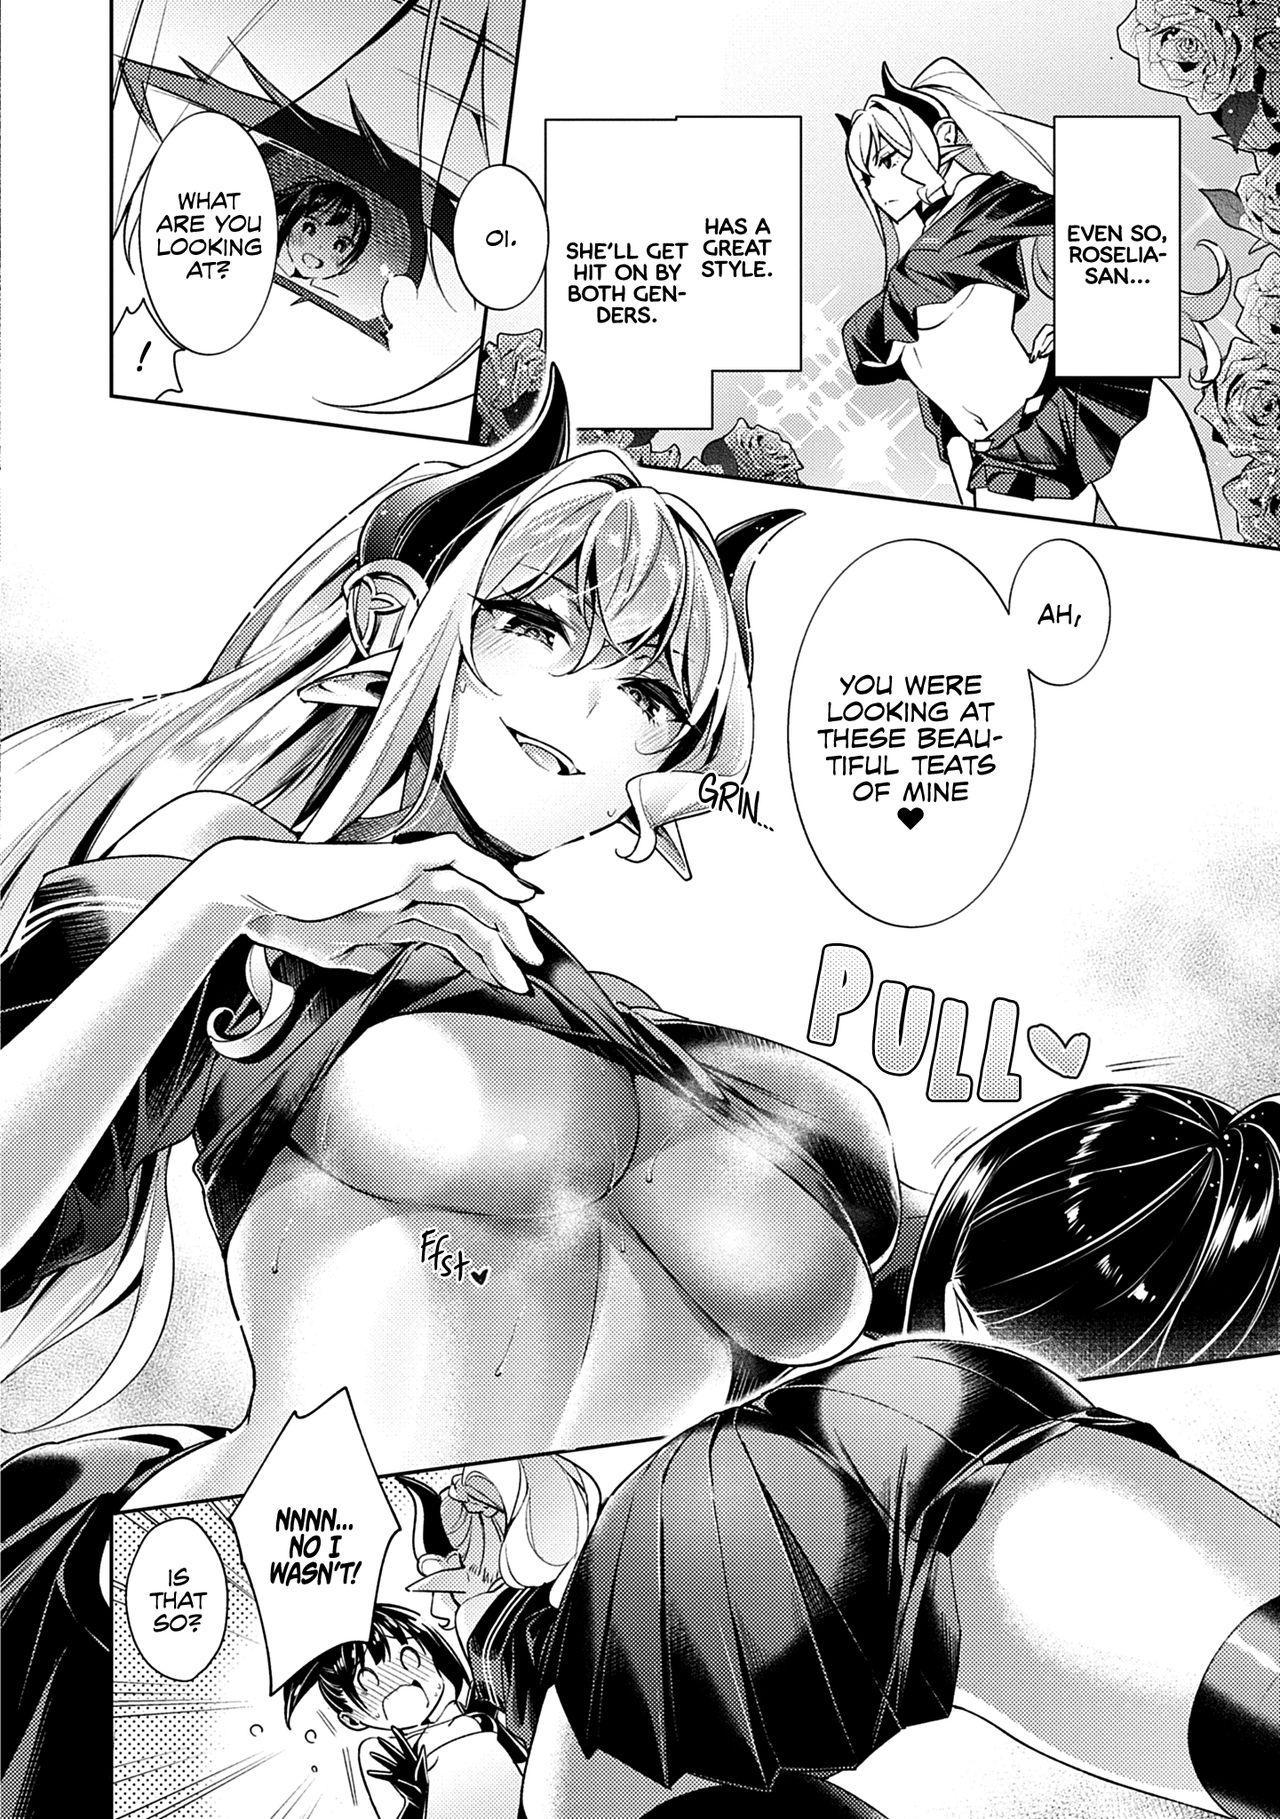 Yokubou Pandora Chapter 7 12